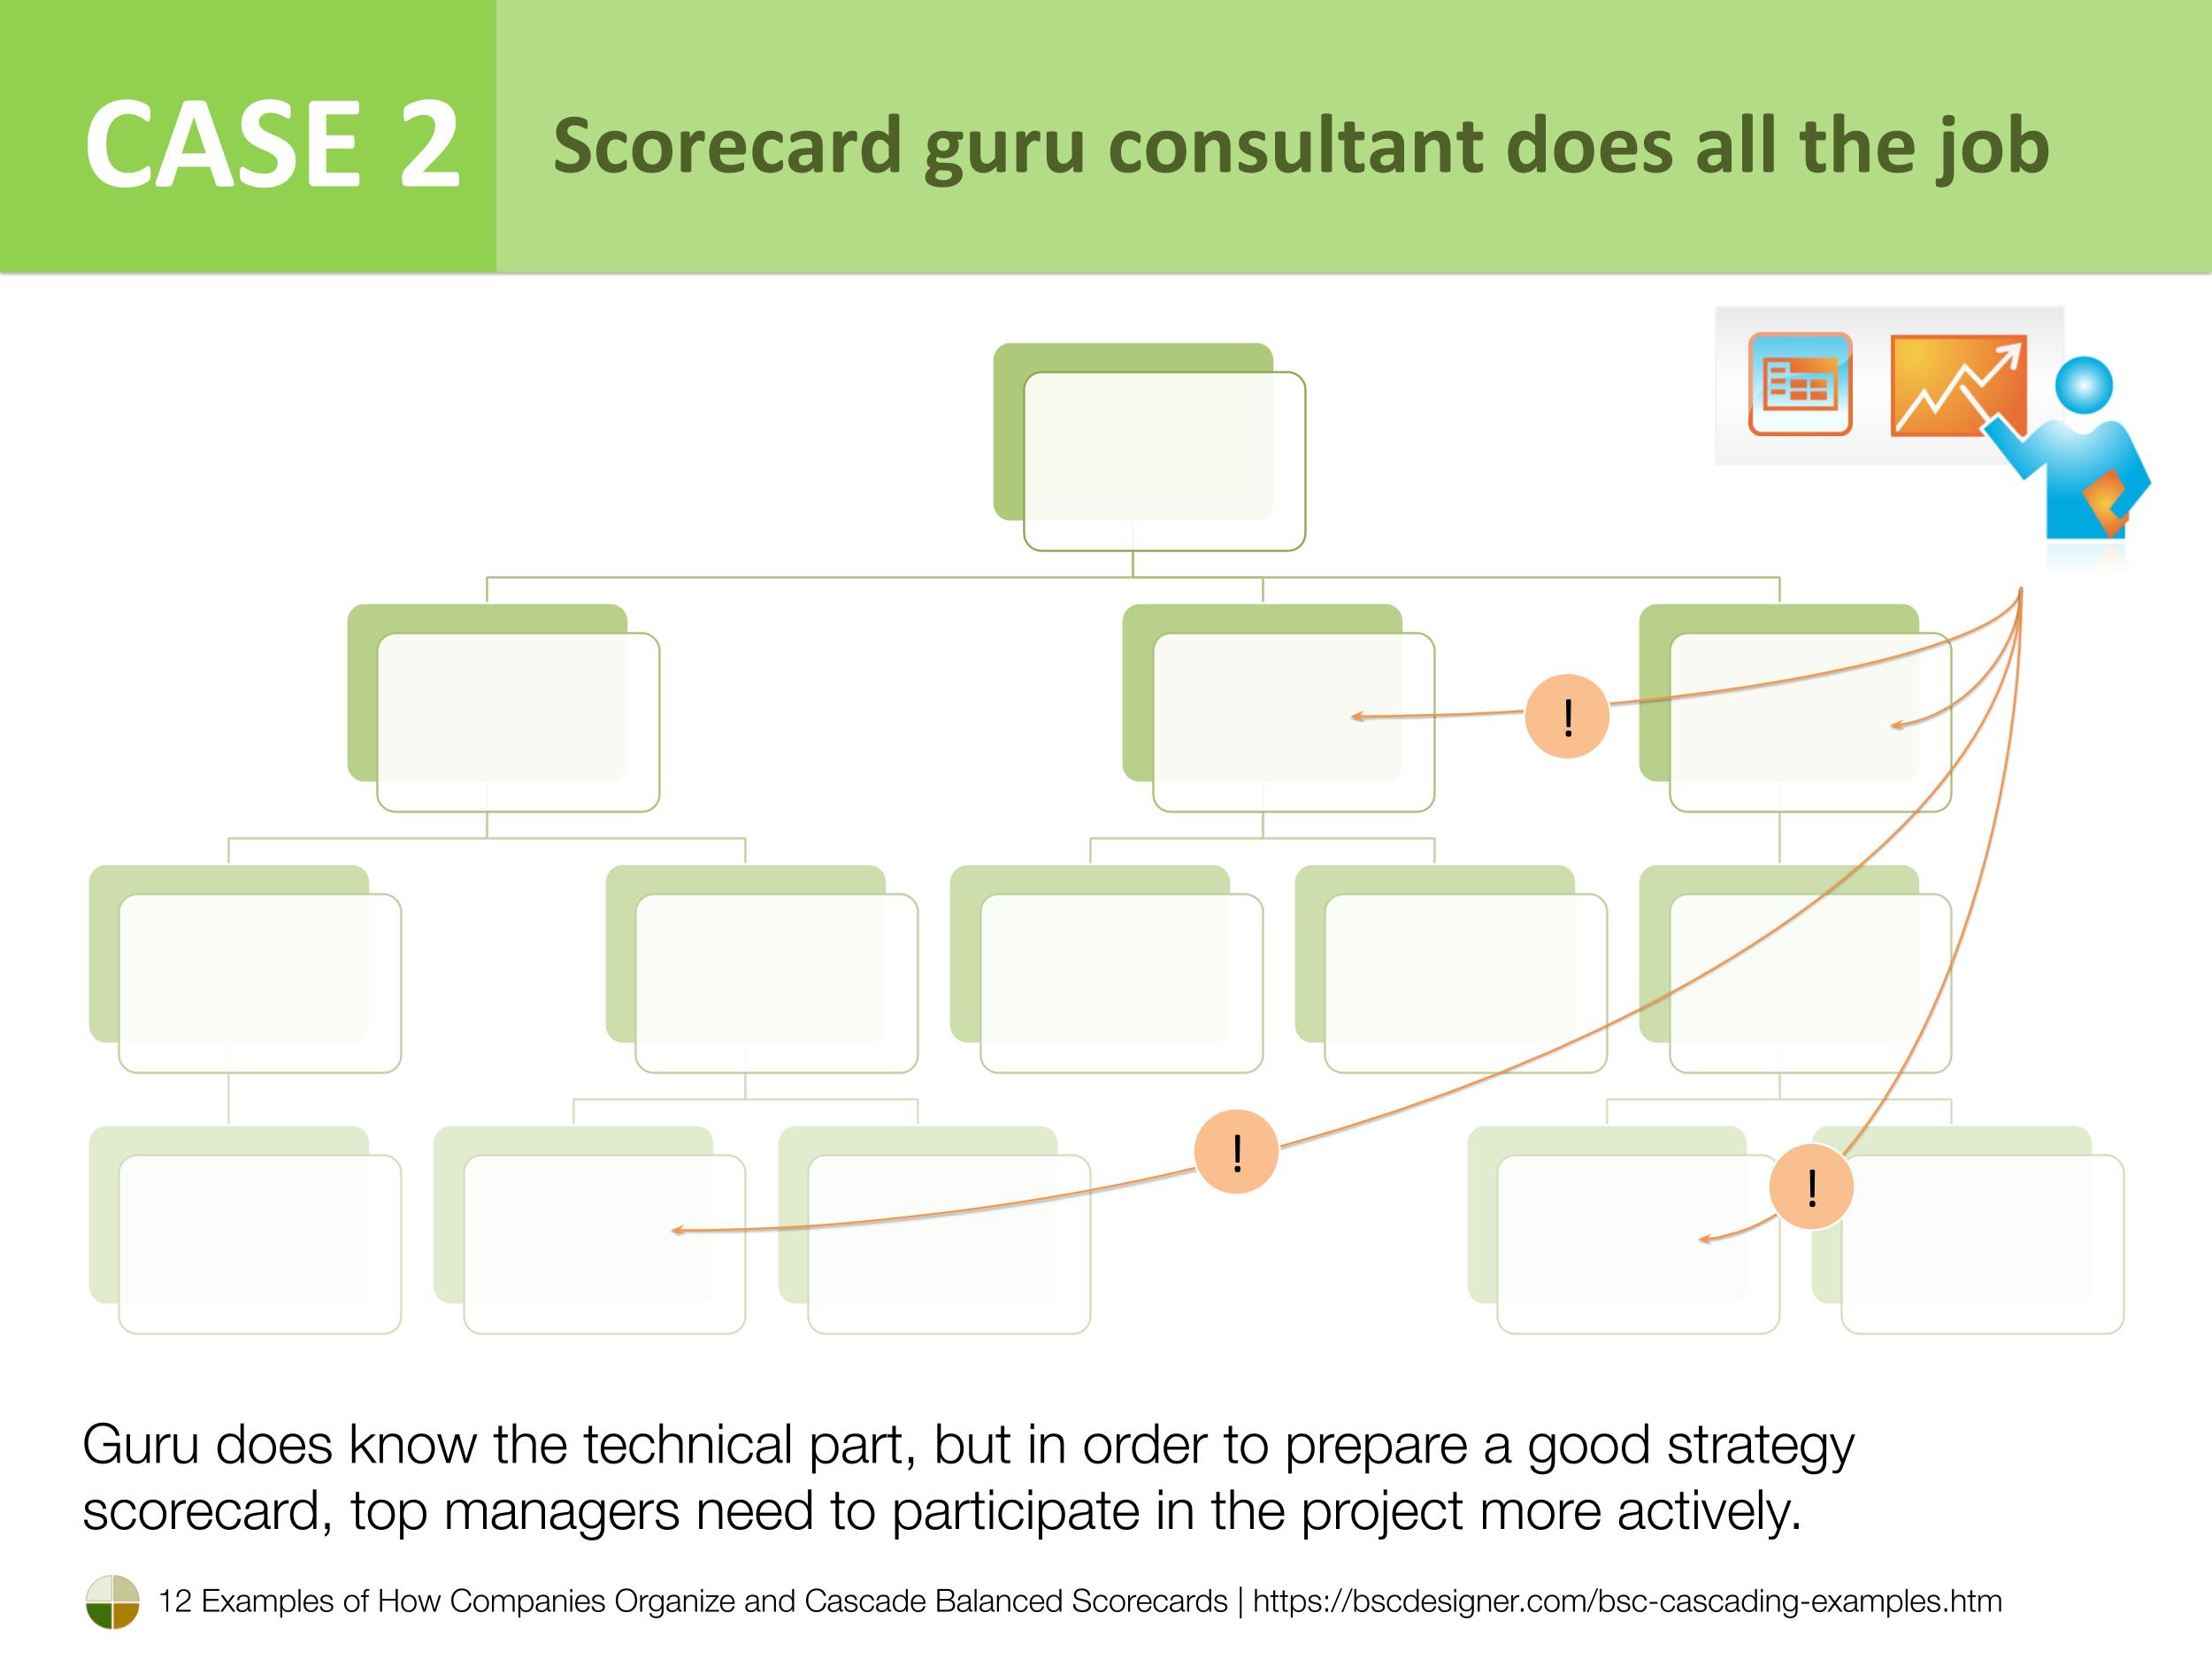 Case 2 - Scorecard guru consultant does all the job